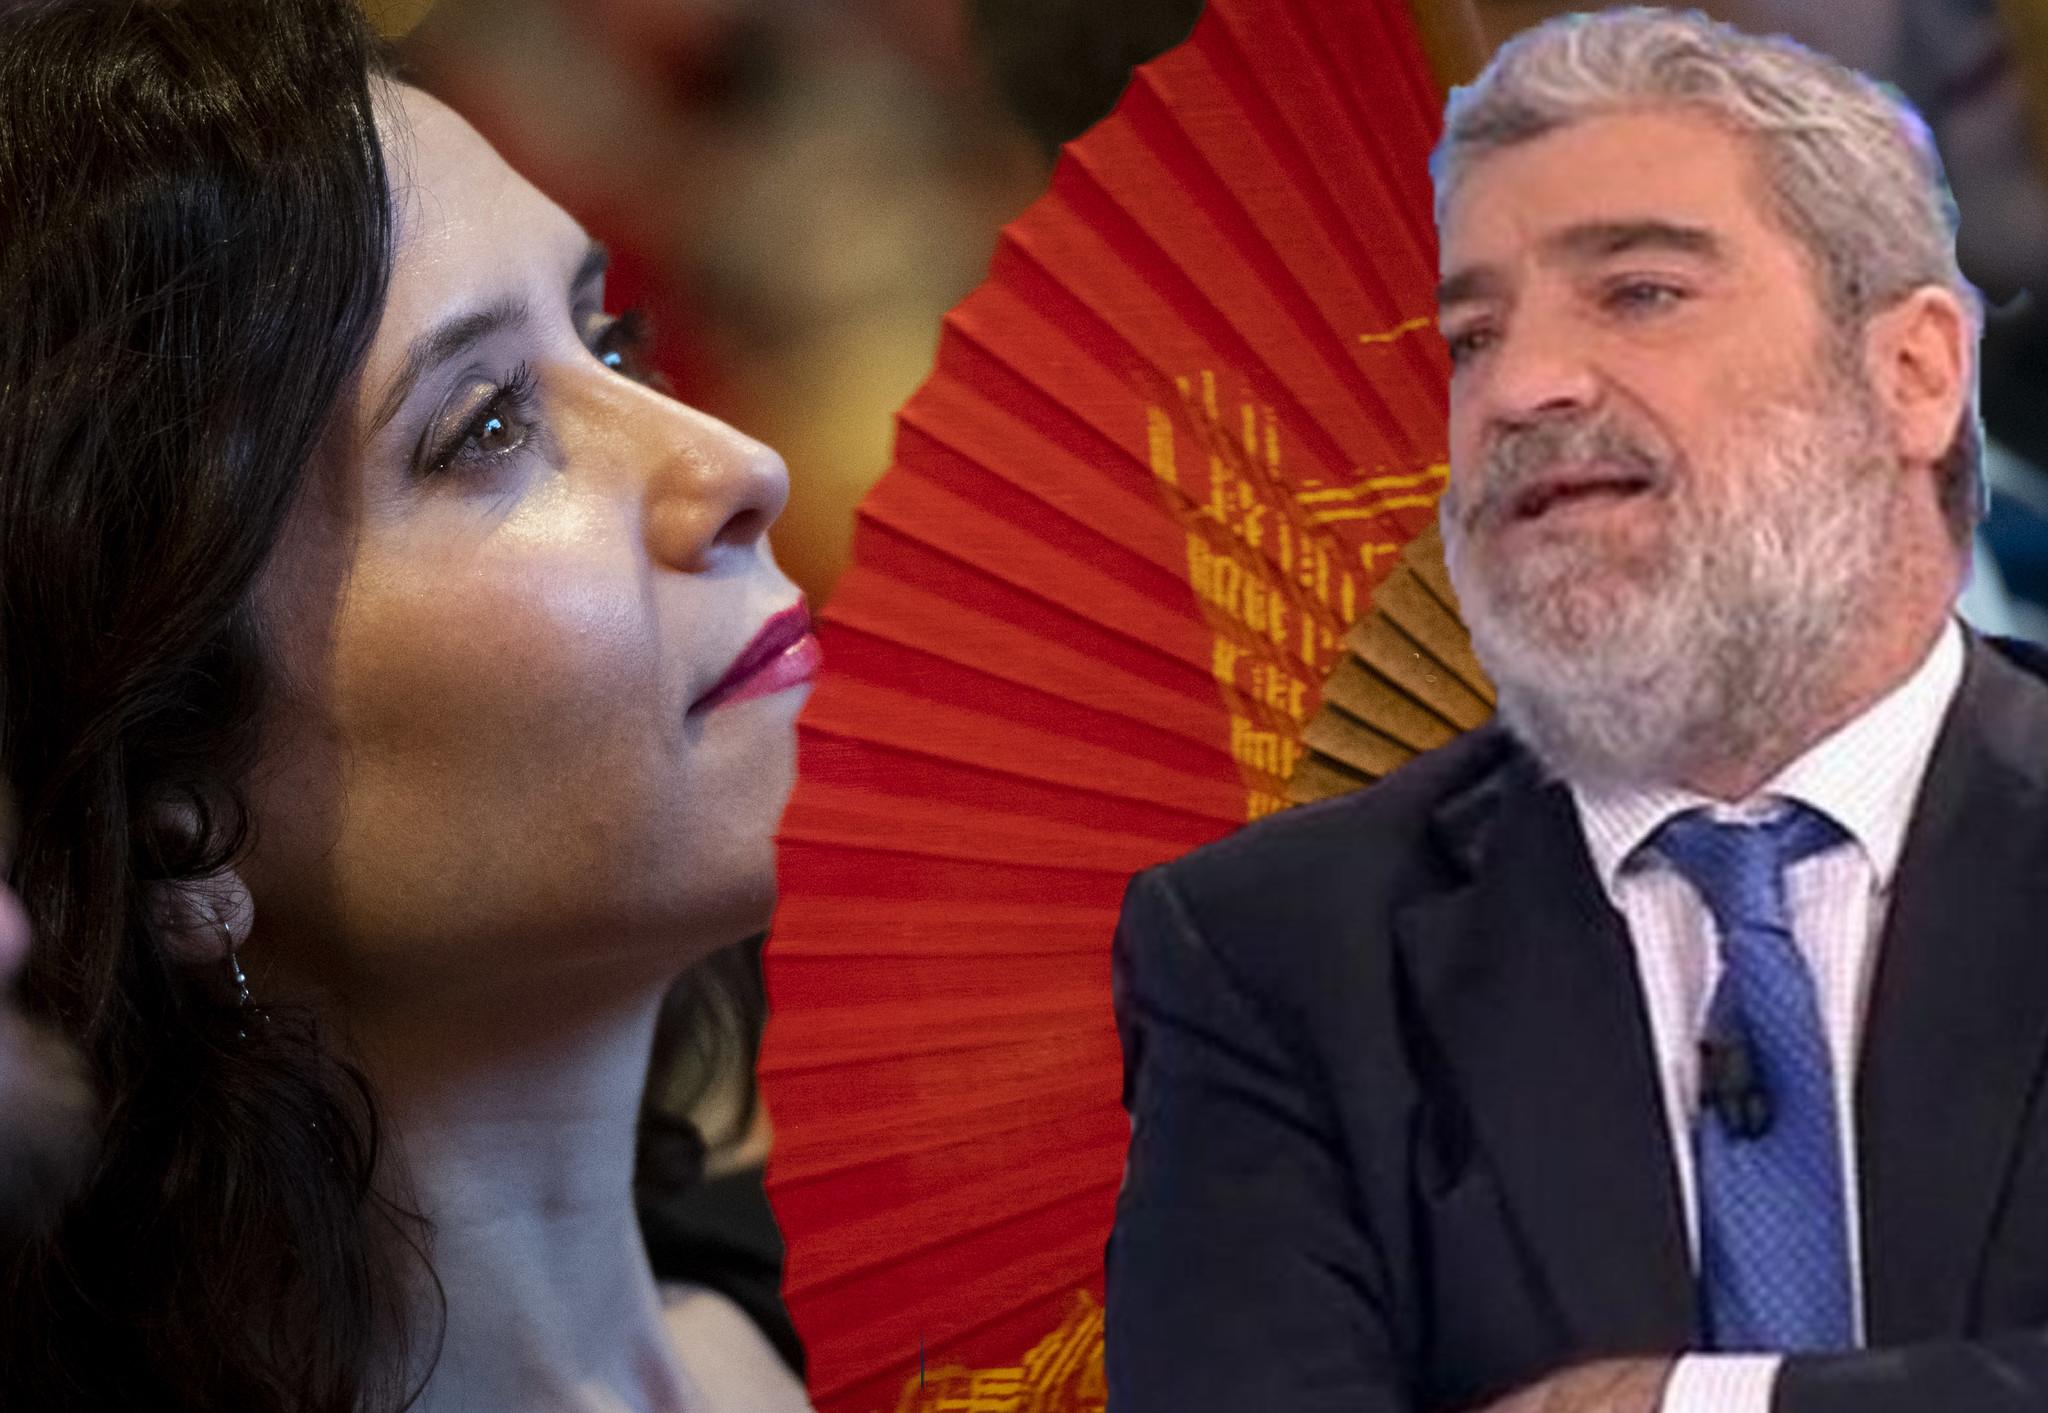 Isabel Díaz Ayuso pone nervioso a Pablo Casado